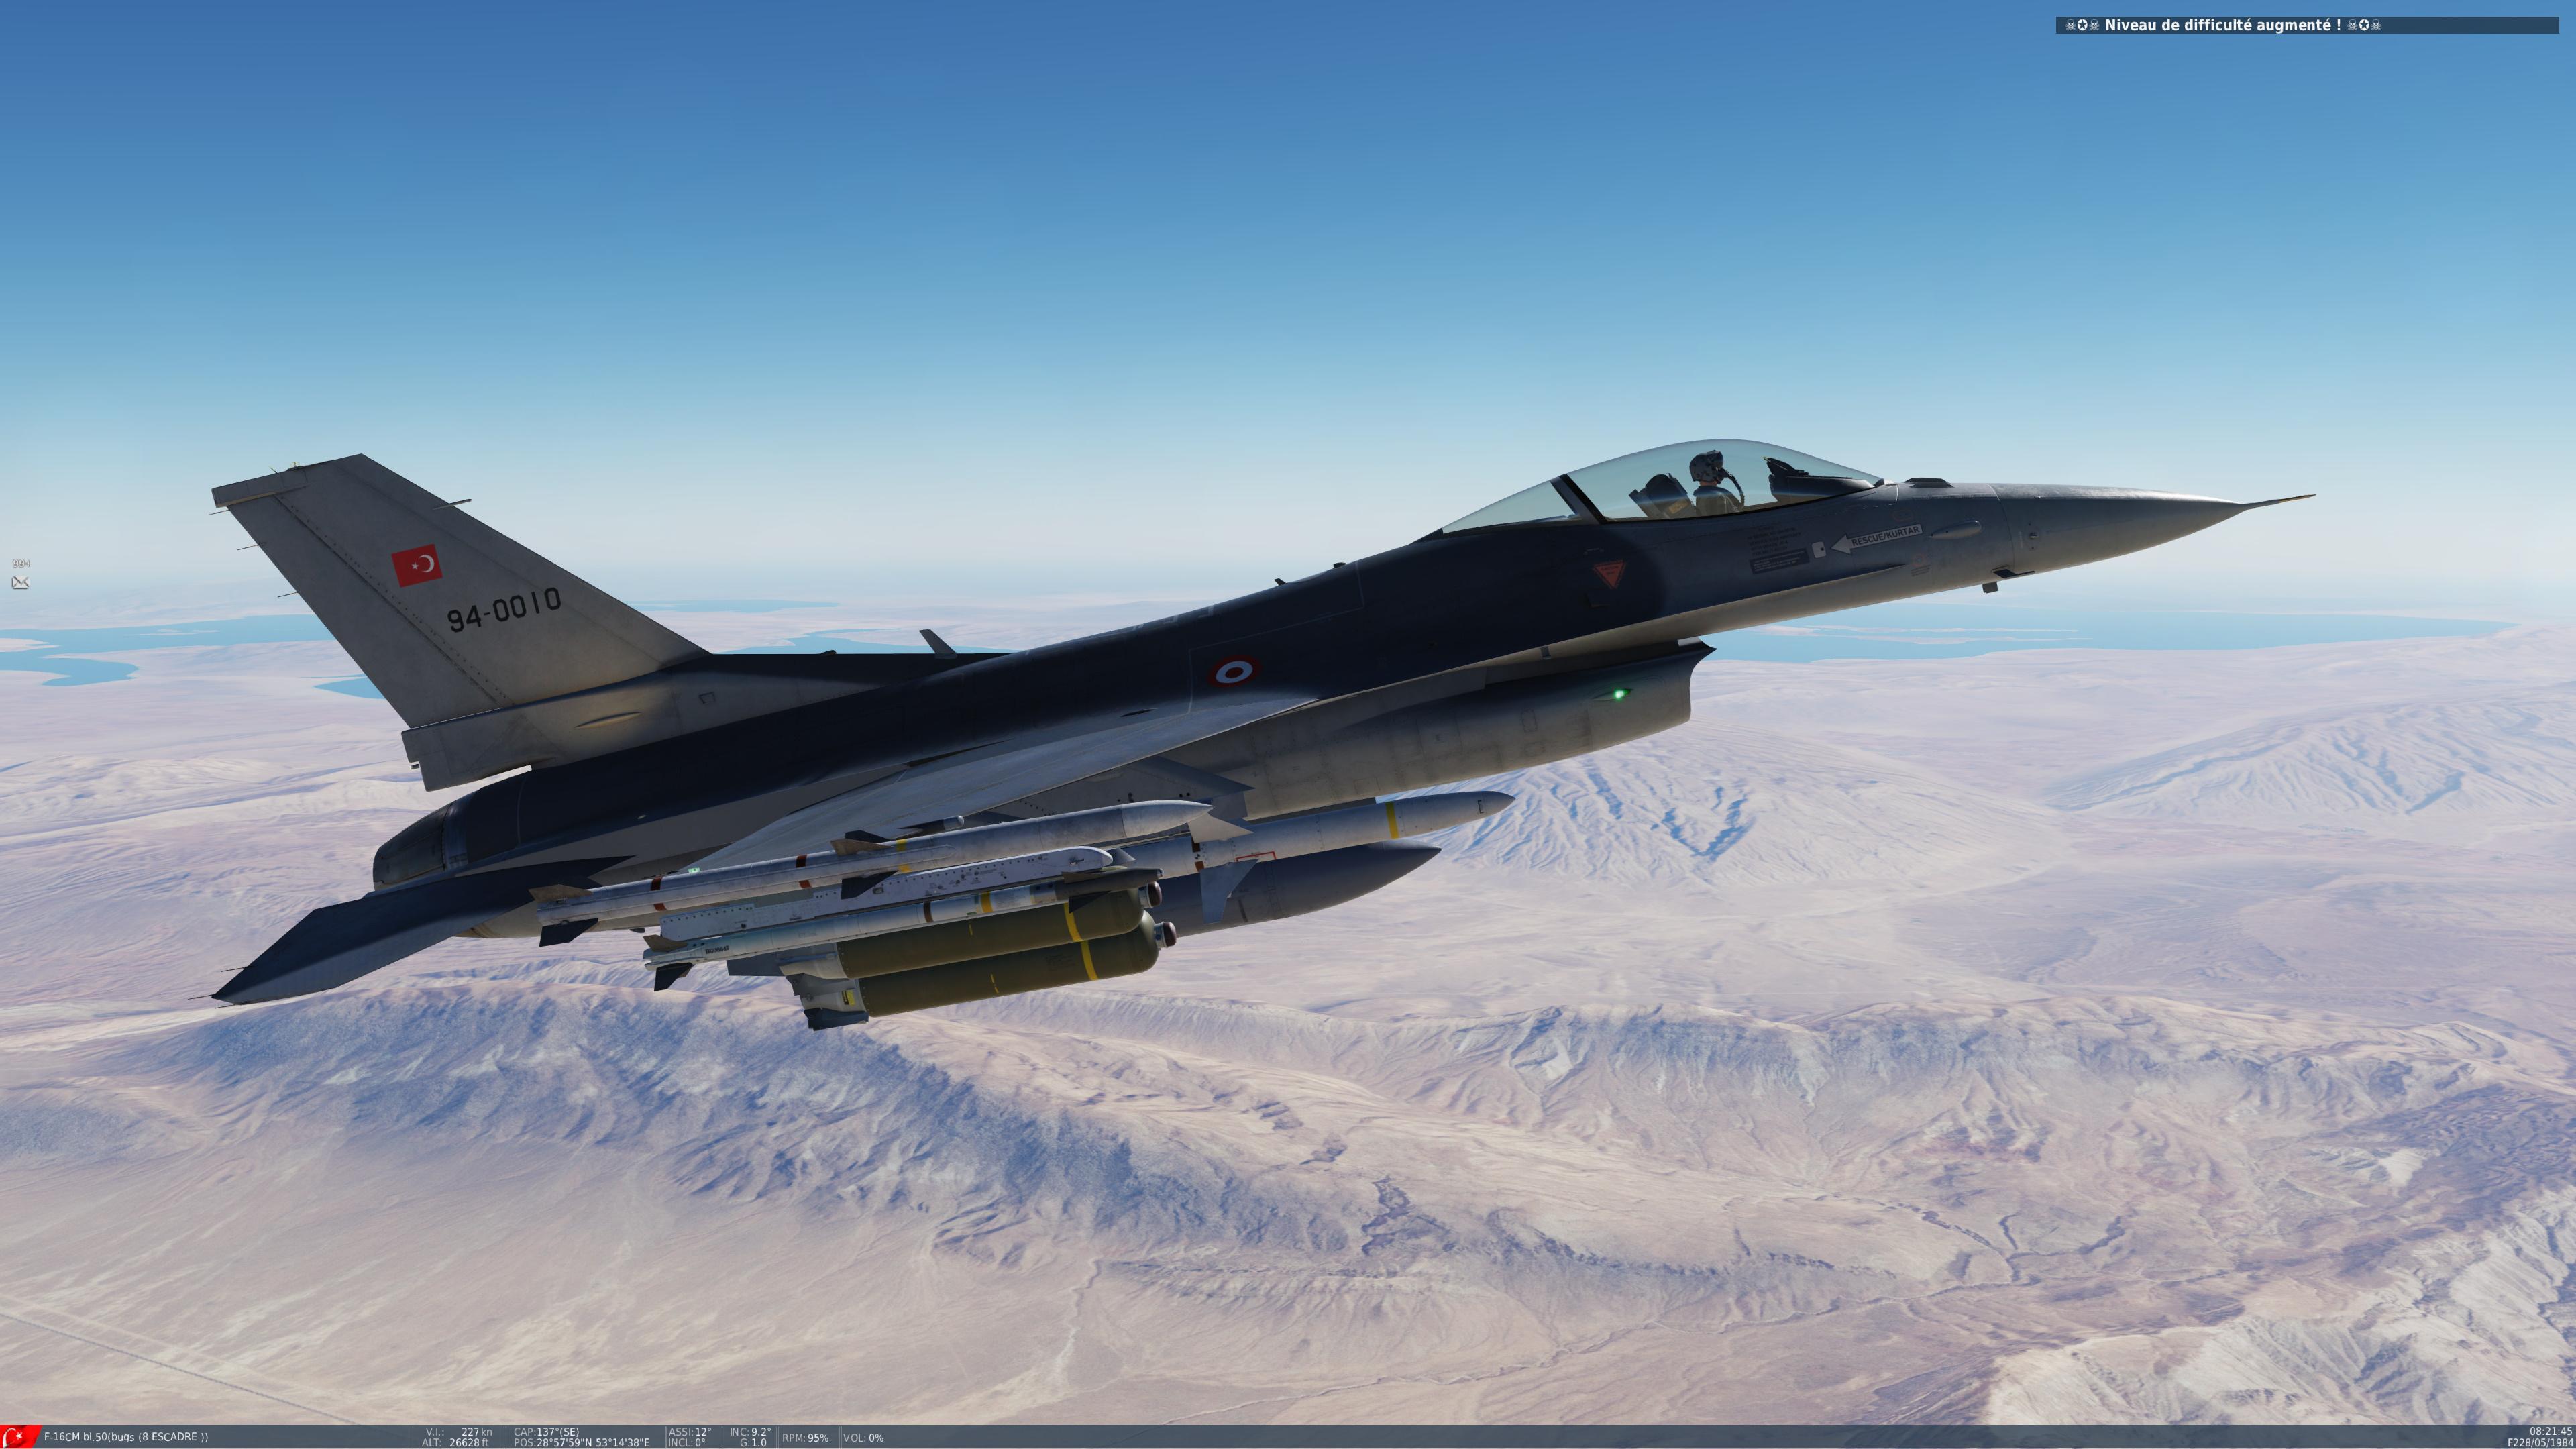 [Cursus UH-1H Huey] Photos de nos missions Bandicam_2021-01-26_22-28-36-201